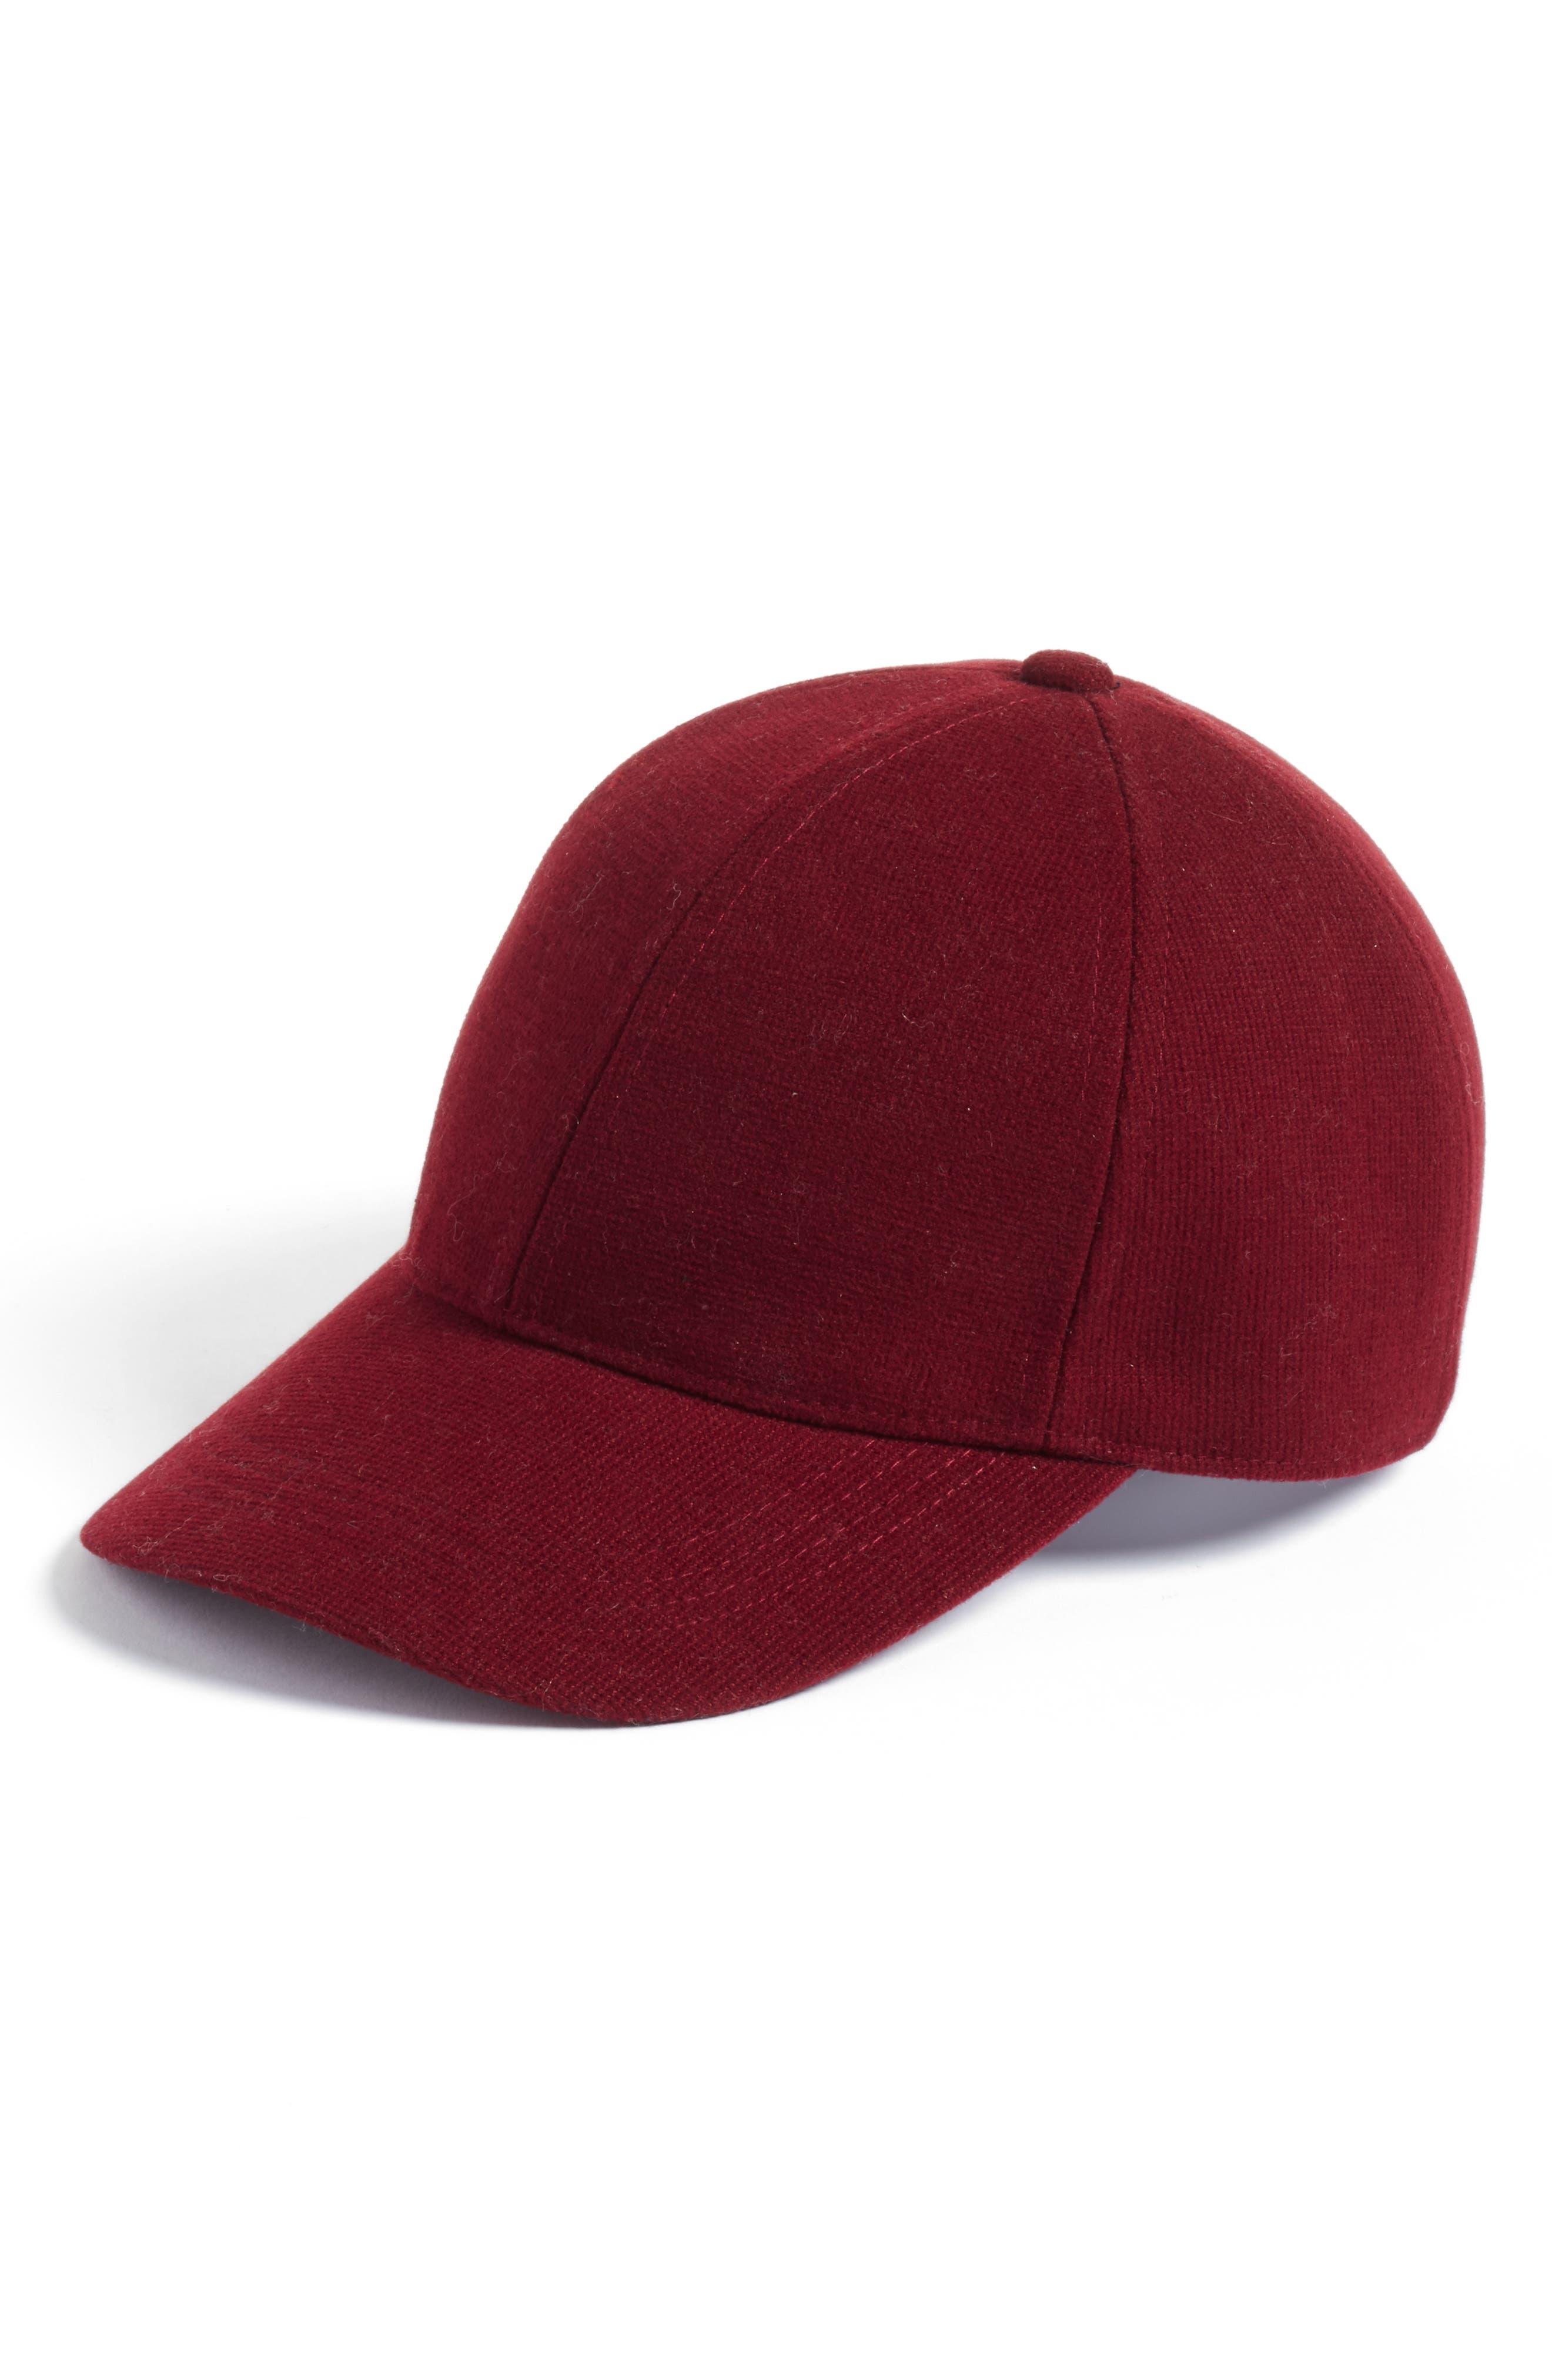 Treasure & Bond Adjustable Baseball Cap